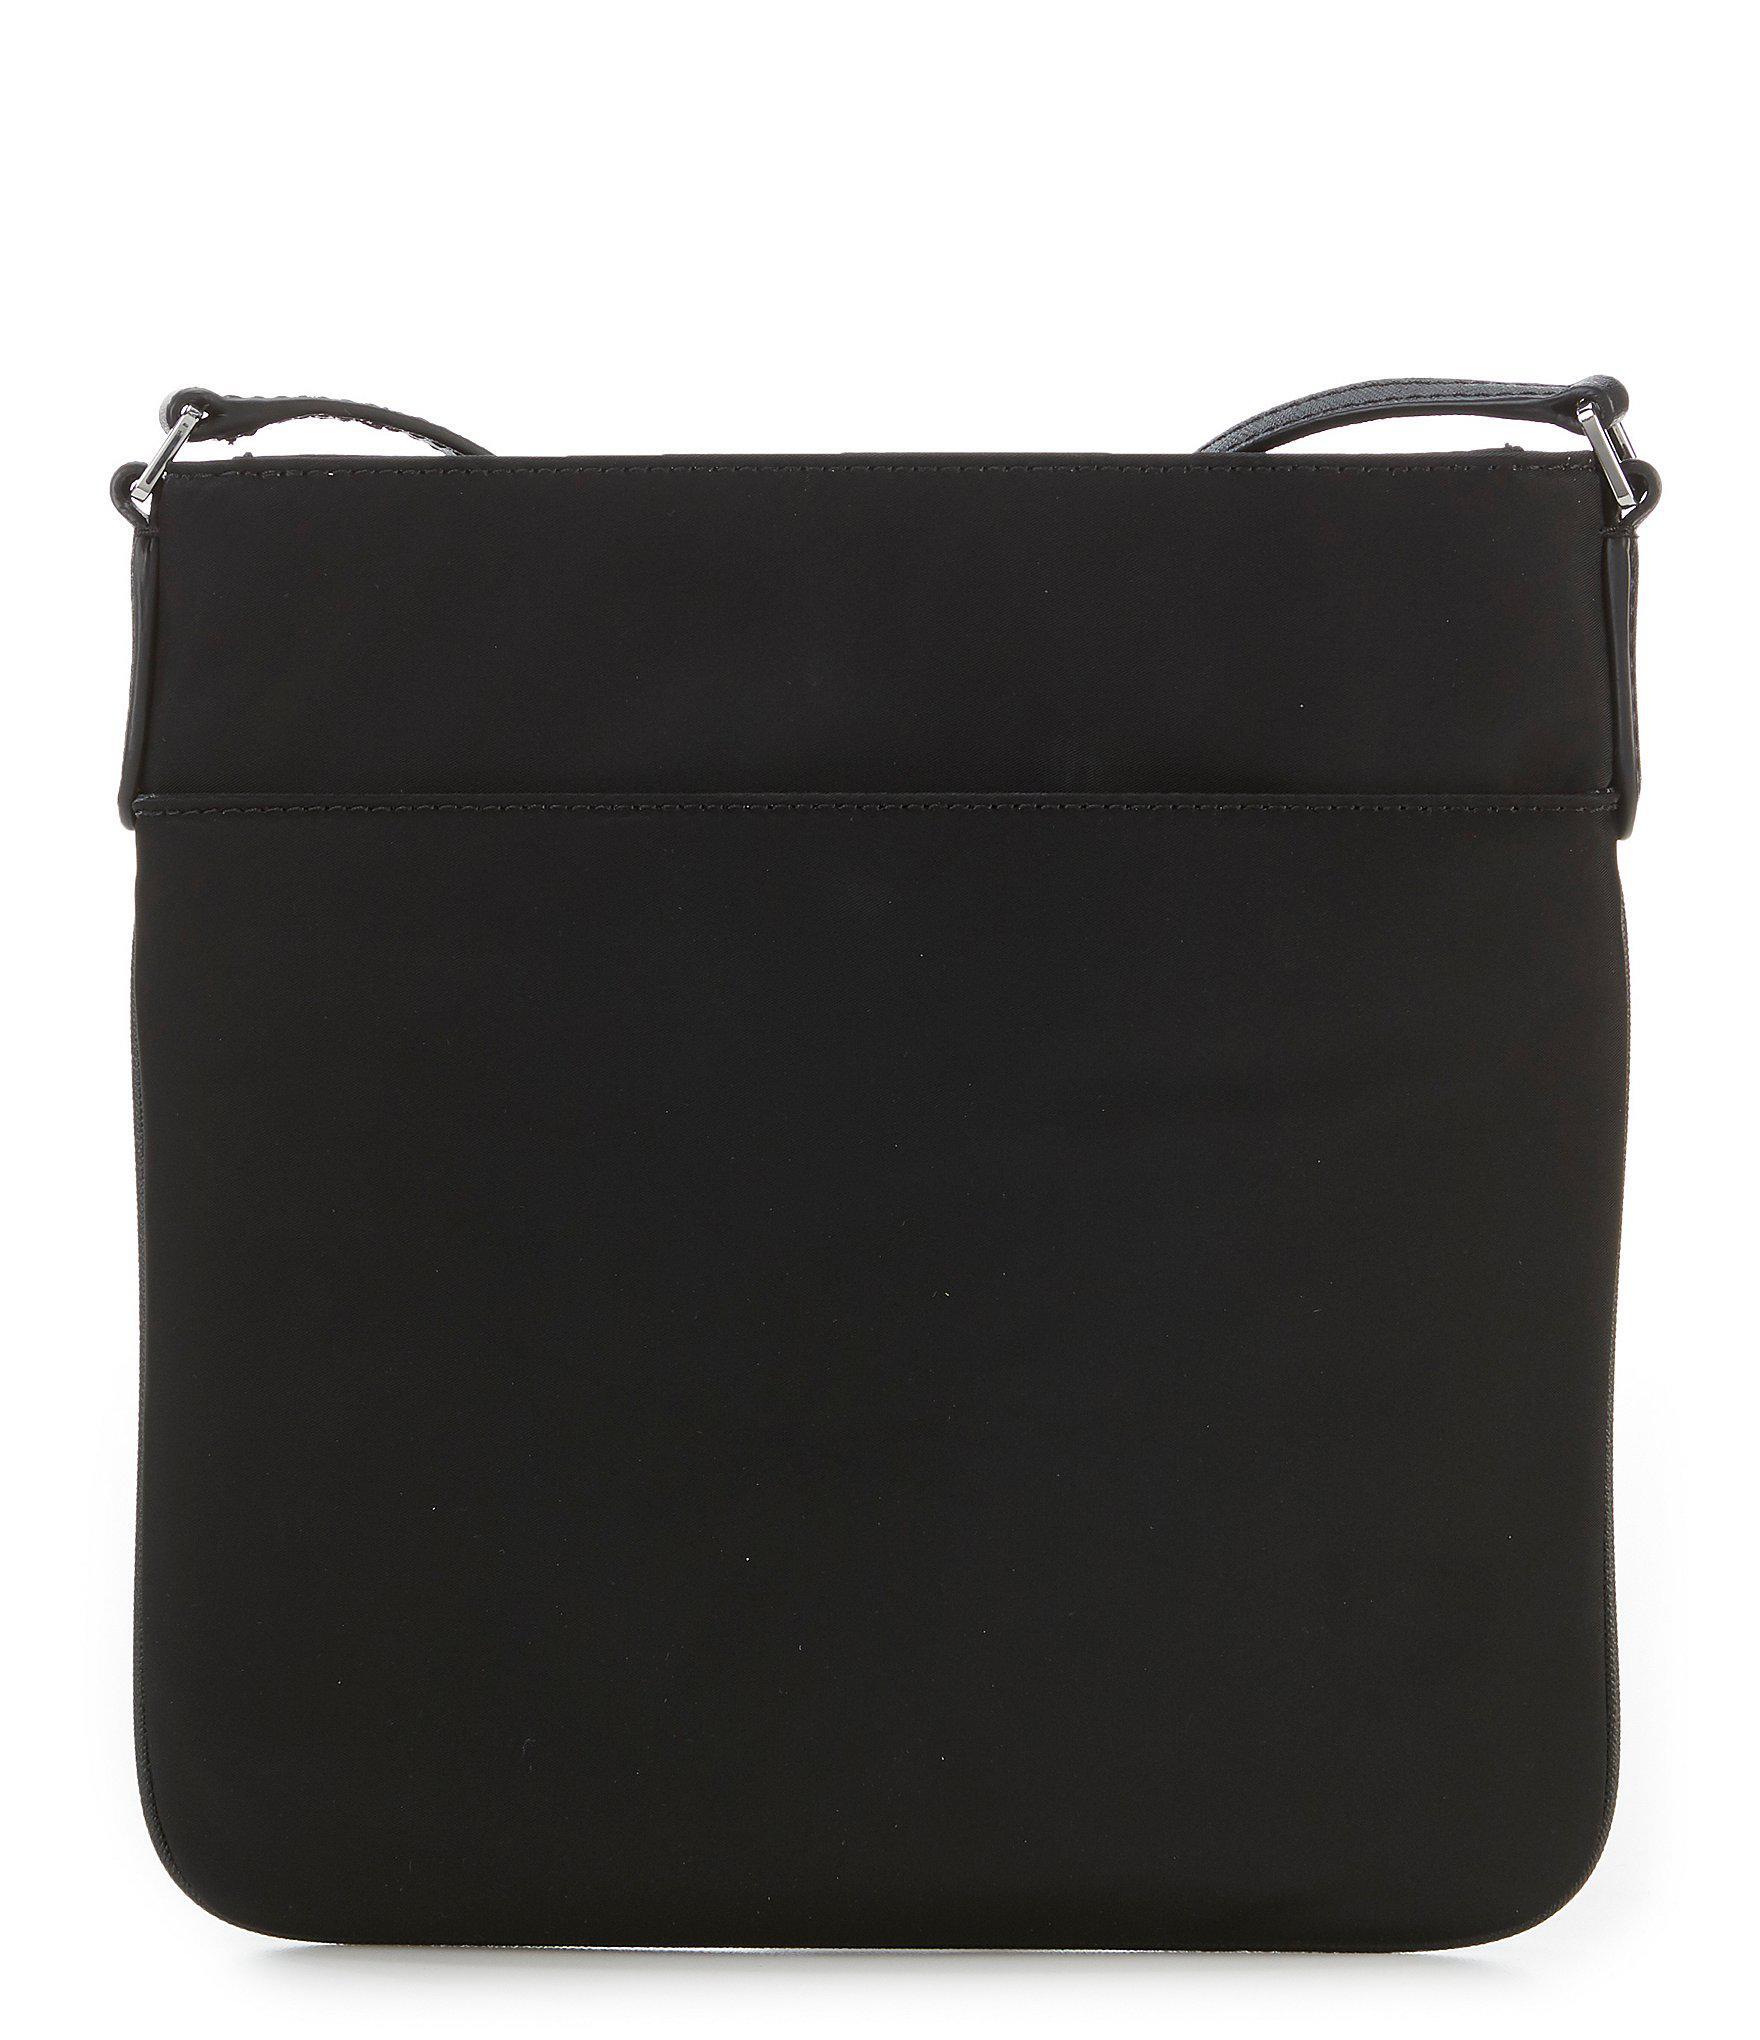 f2901eeac4 MICHAEL Michael Kors - Black Kelsey Nylon Large Cross-body Bag - Lyst. View  fullscreen